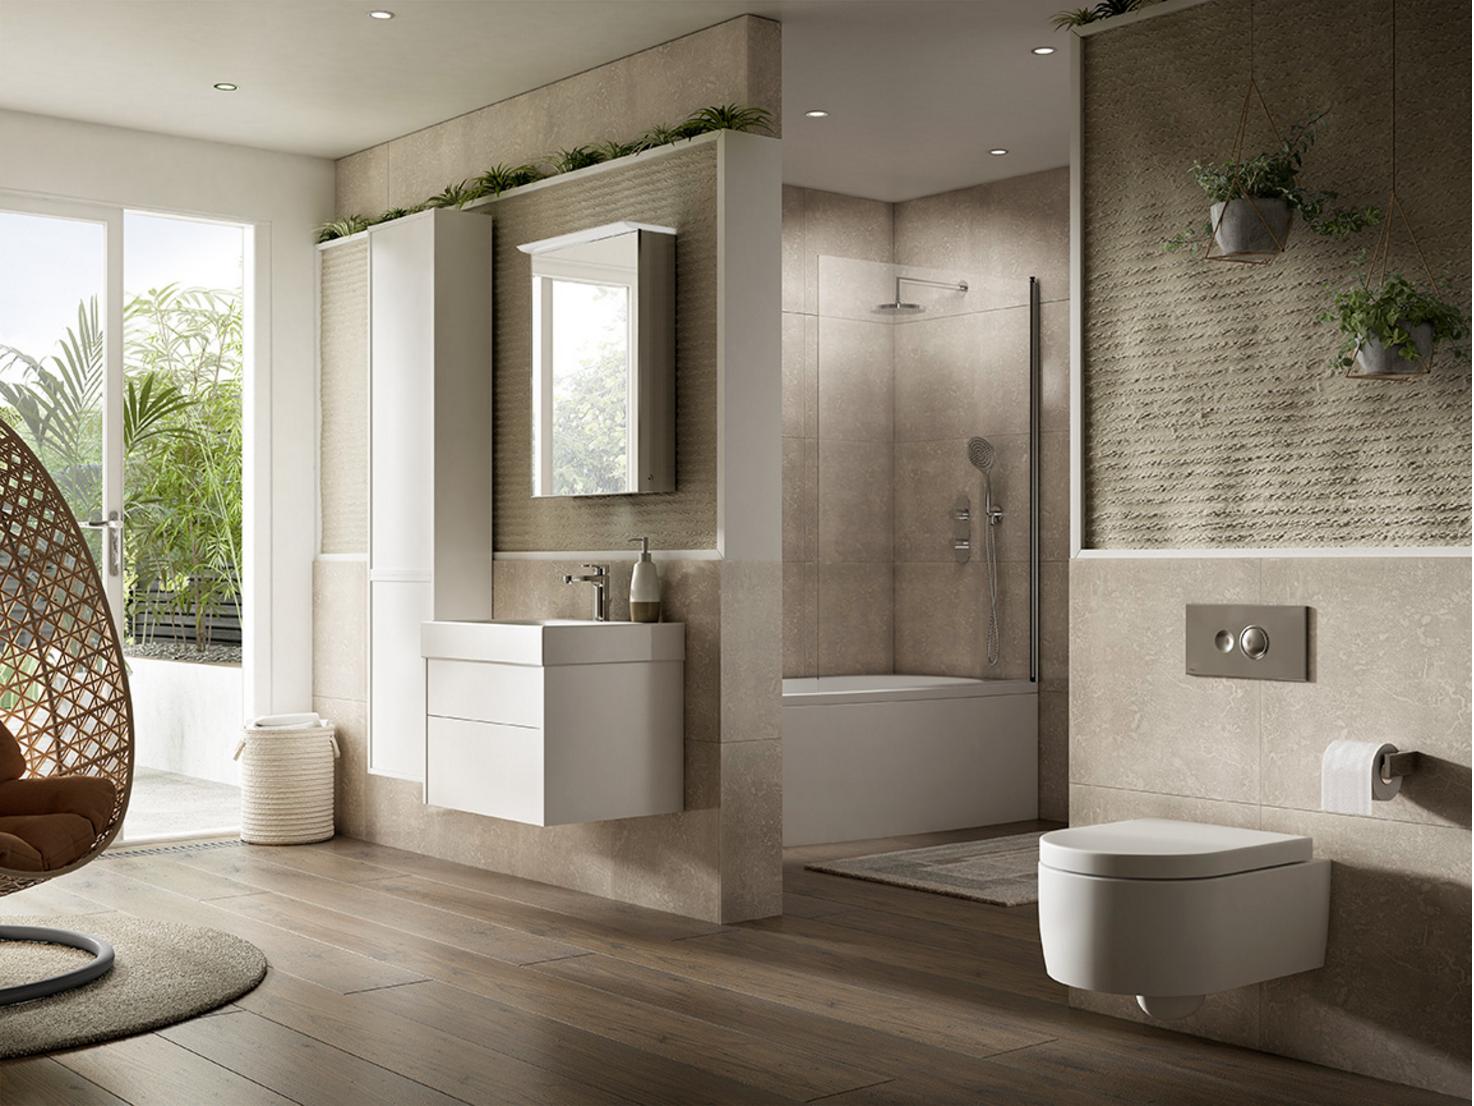 No Code Eco Bathroom Inspiration Stye Bathroom Eco Ecological